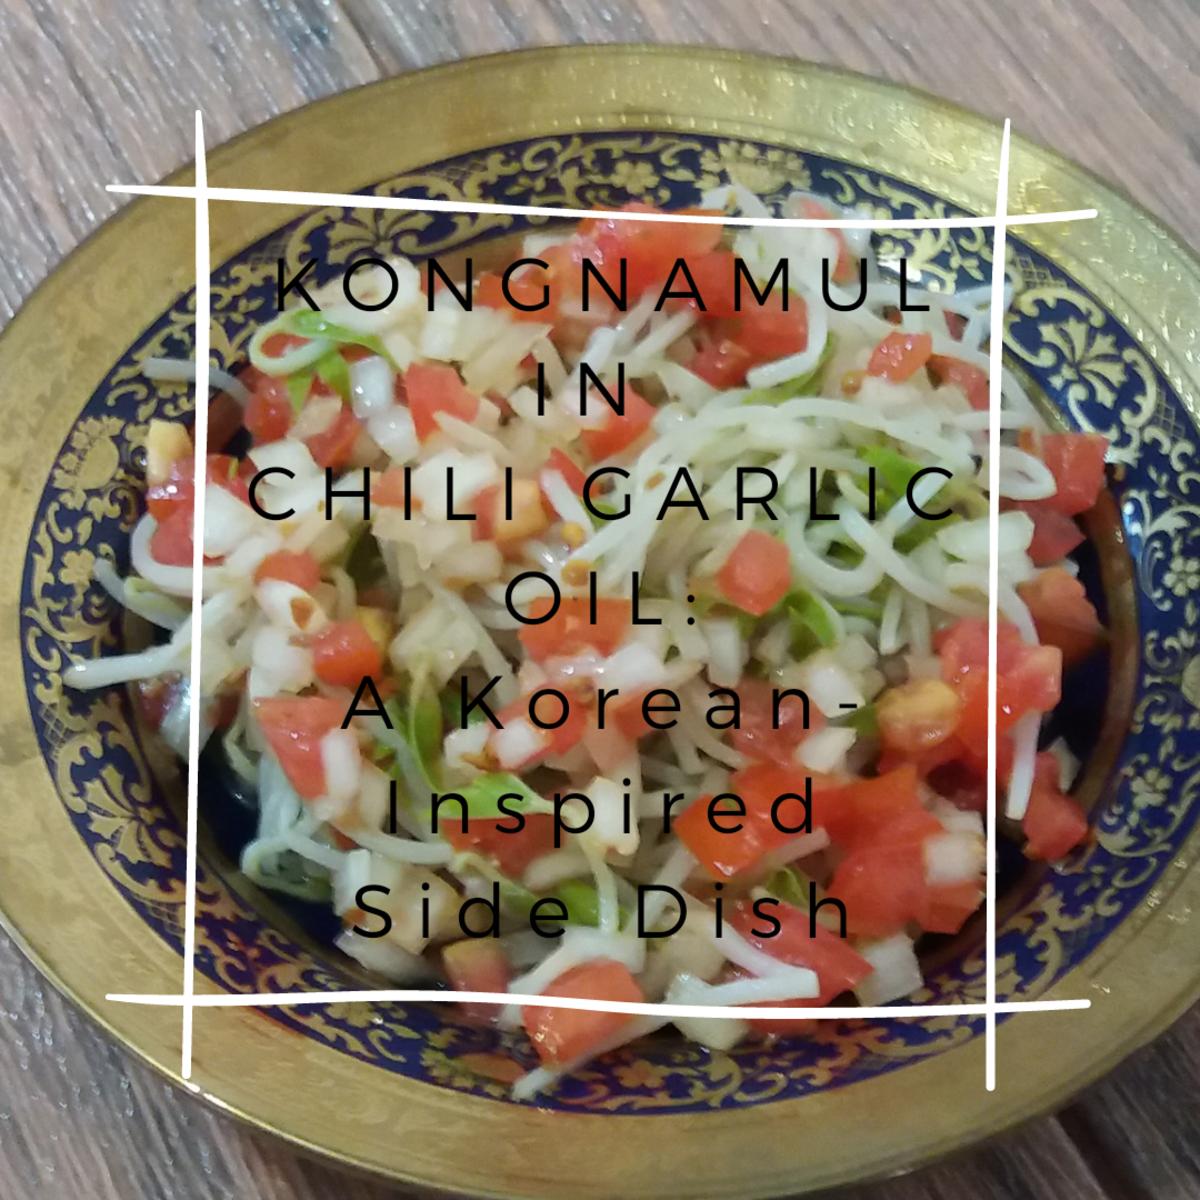 Kongnamul in Chili Garlic Oil: A Korean-Inspired Side Dish